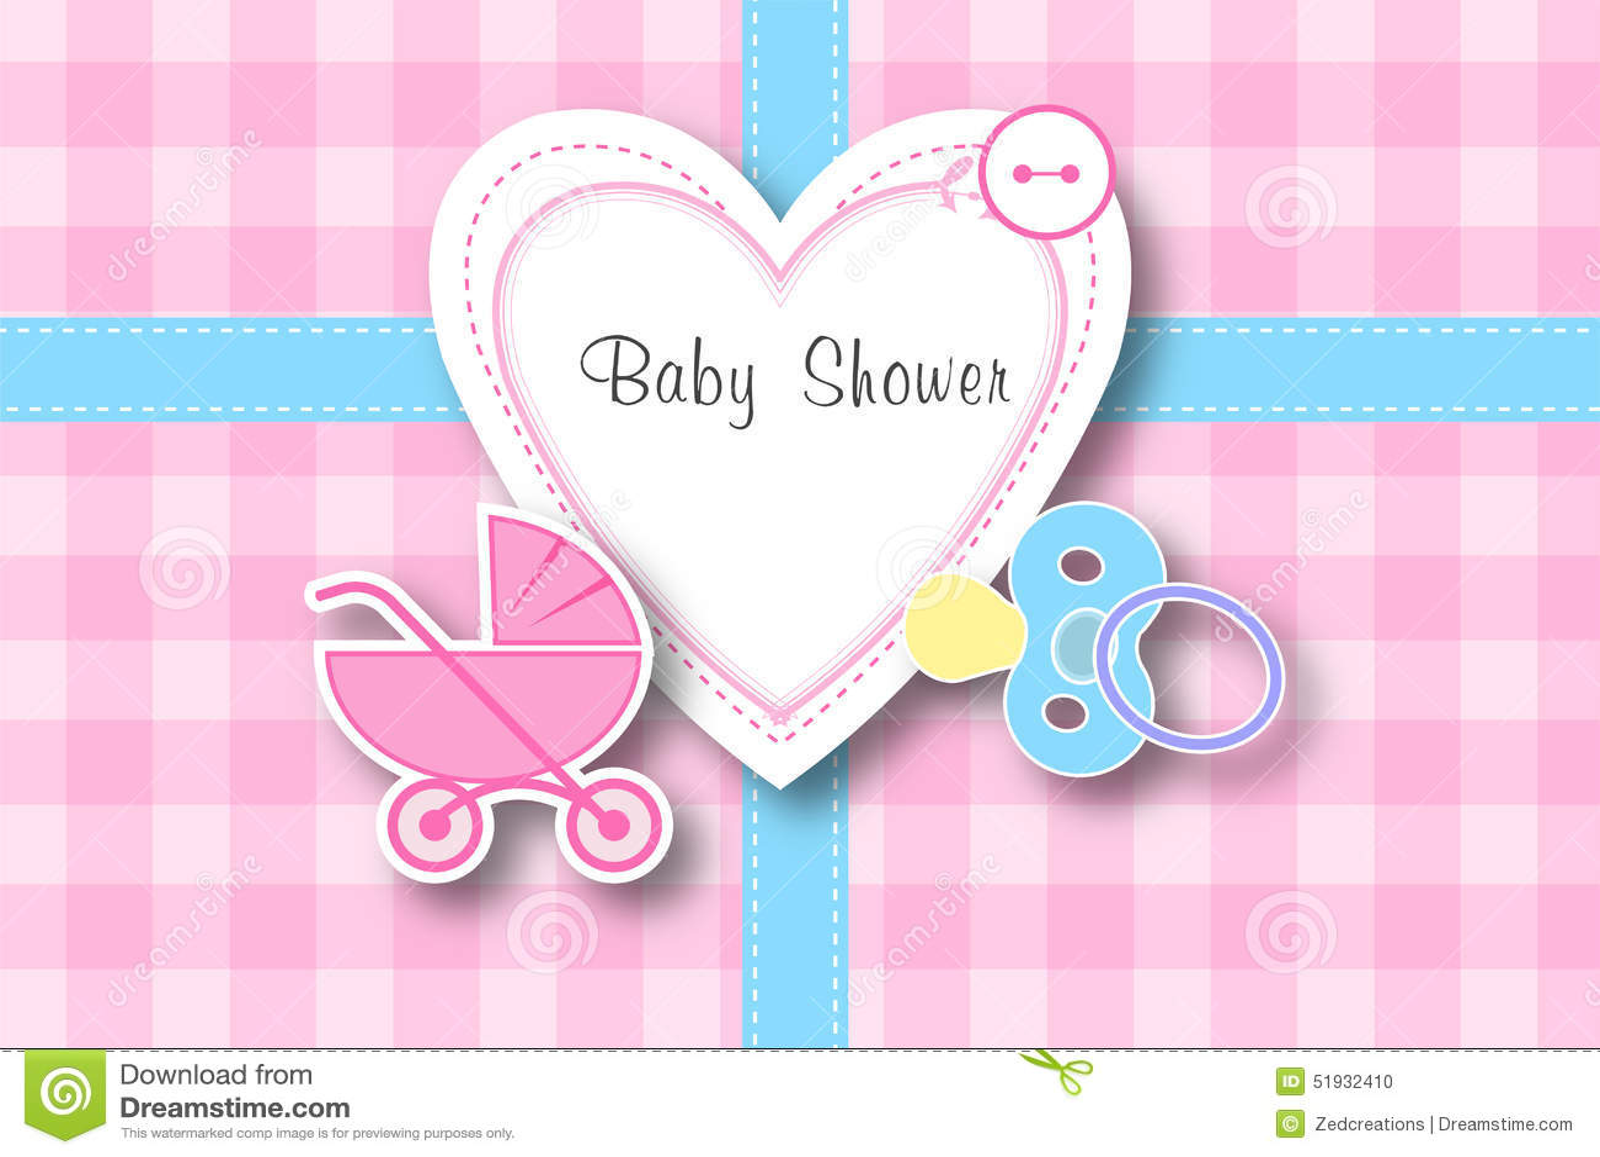 baby shower frame background stock illustration